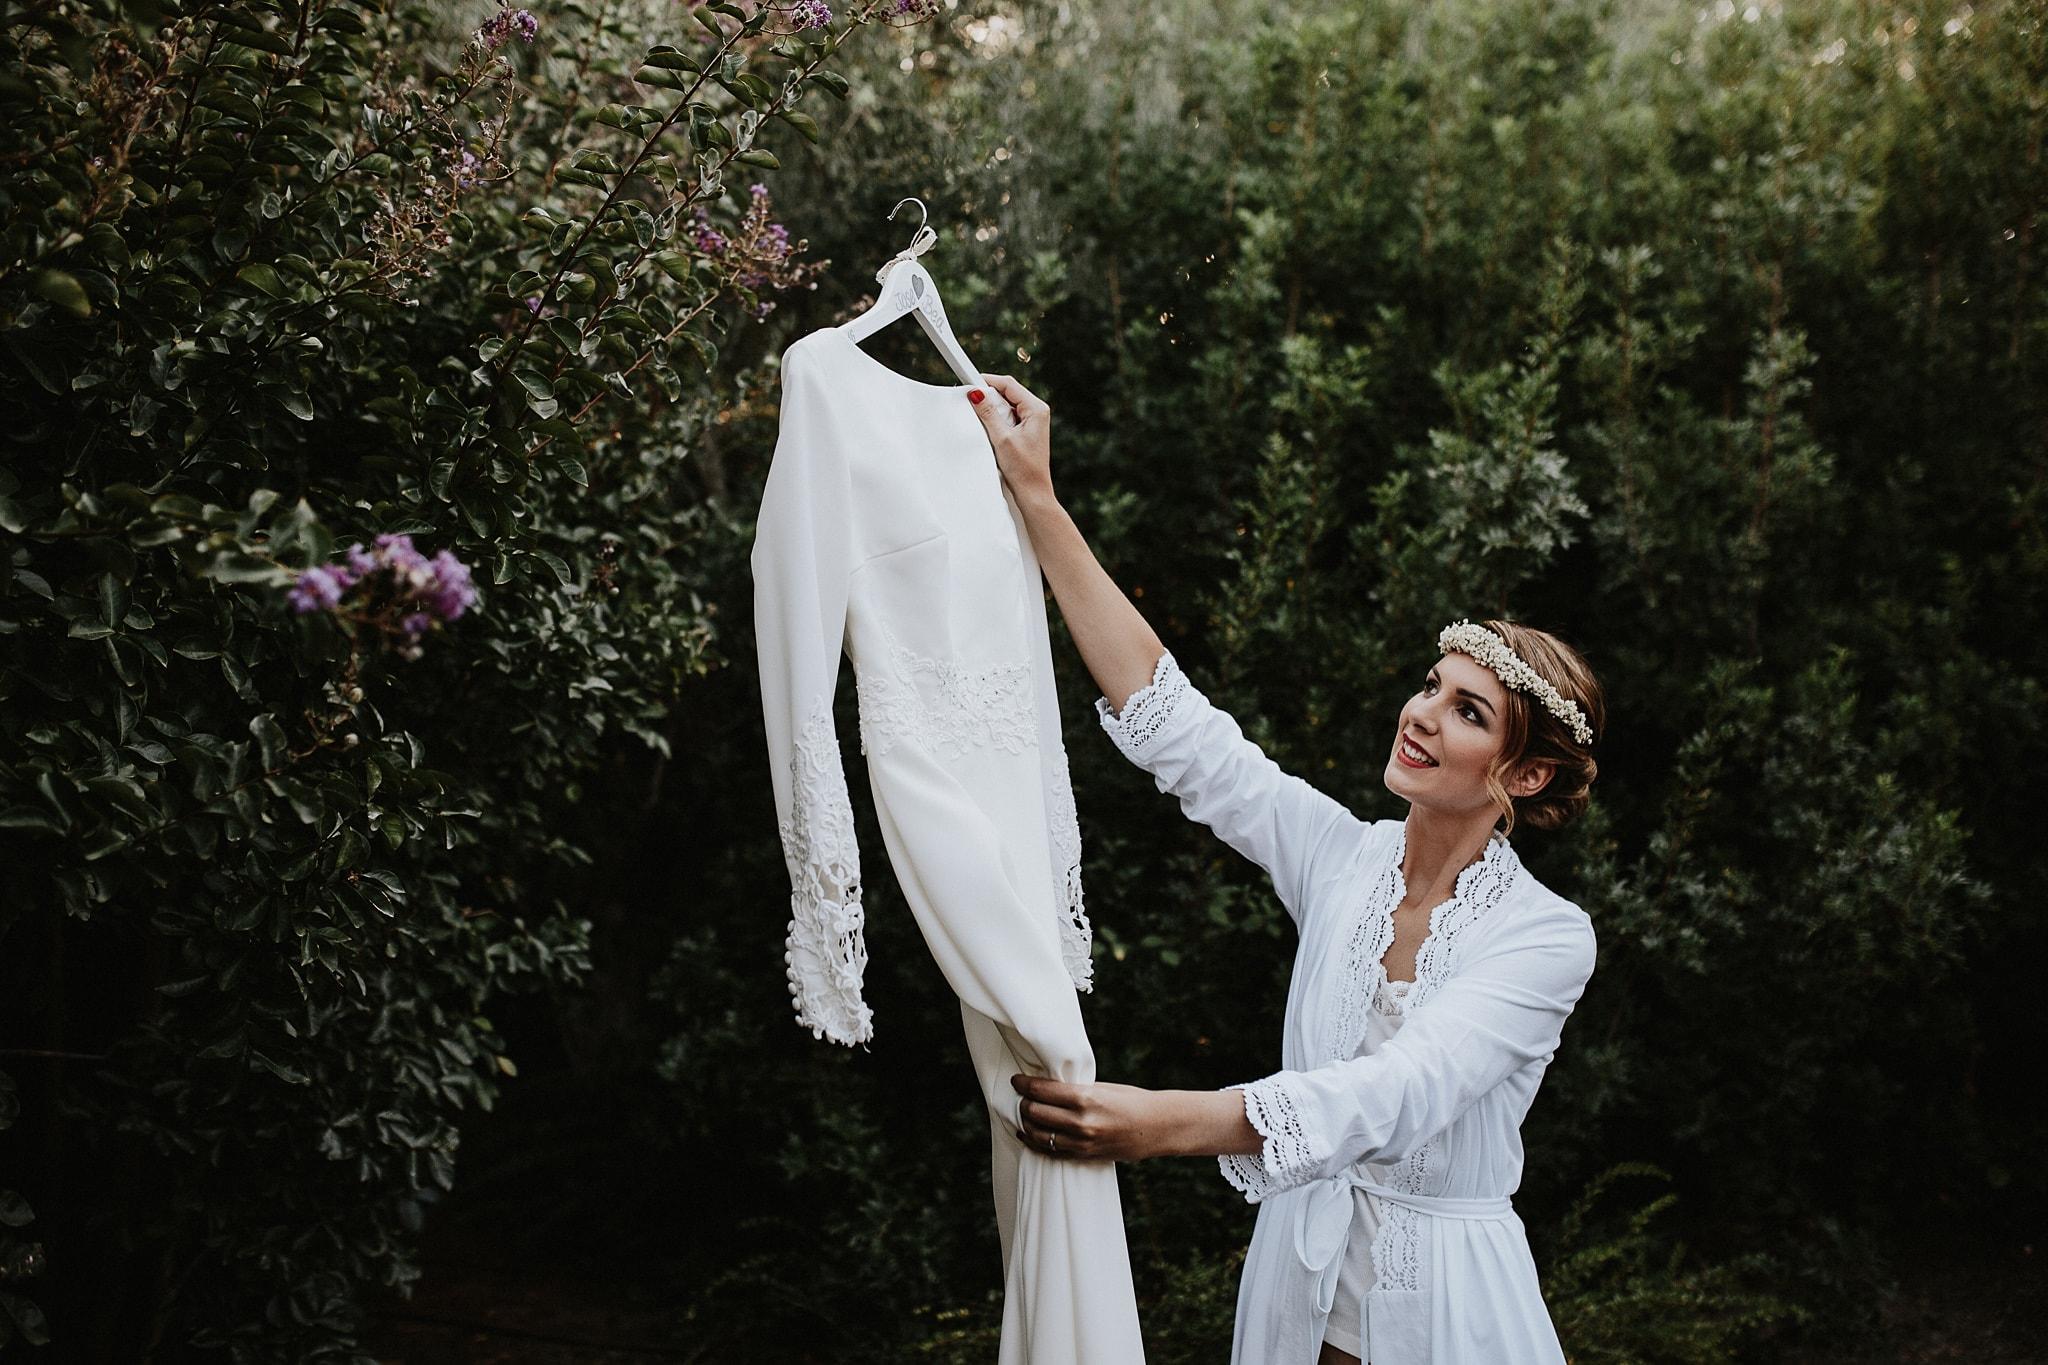 prisma-blanco-fotografos-bodas-toledo-41